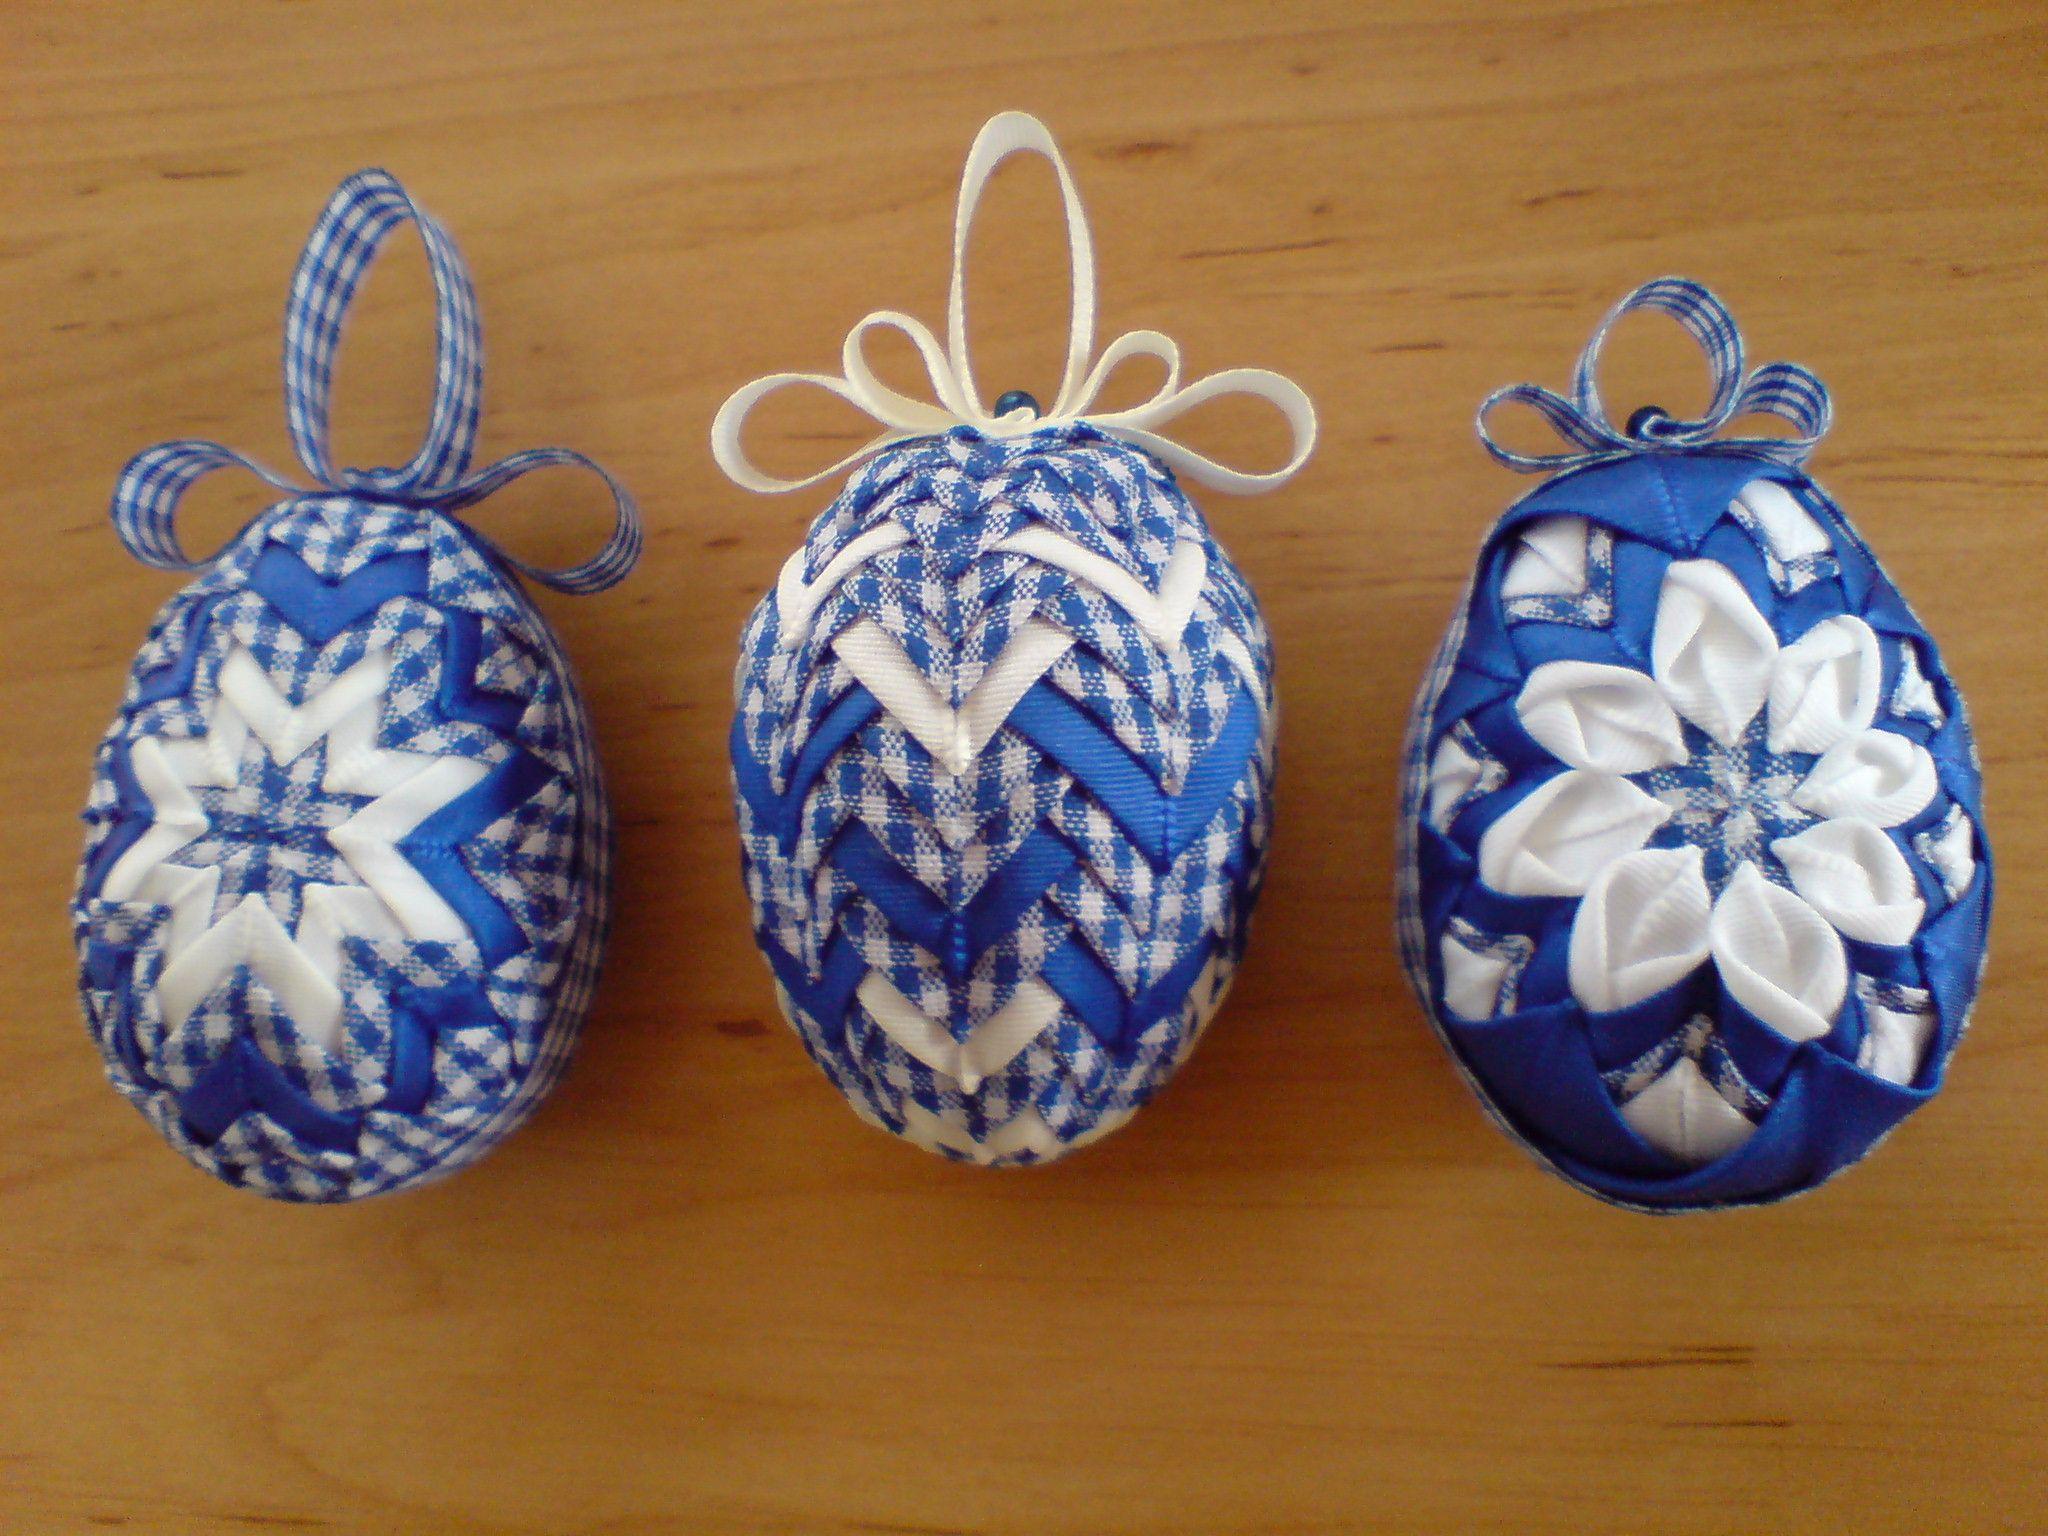 Styrofoam christmas ornaments - Vaj Ka Fabric Ornamentsquilted Ornamentschristmas Ornamentsstyrofoam